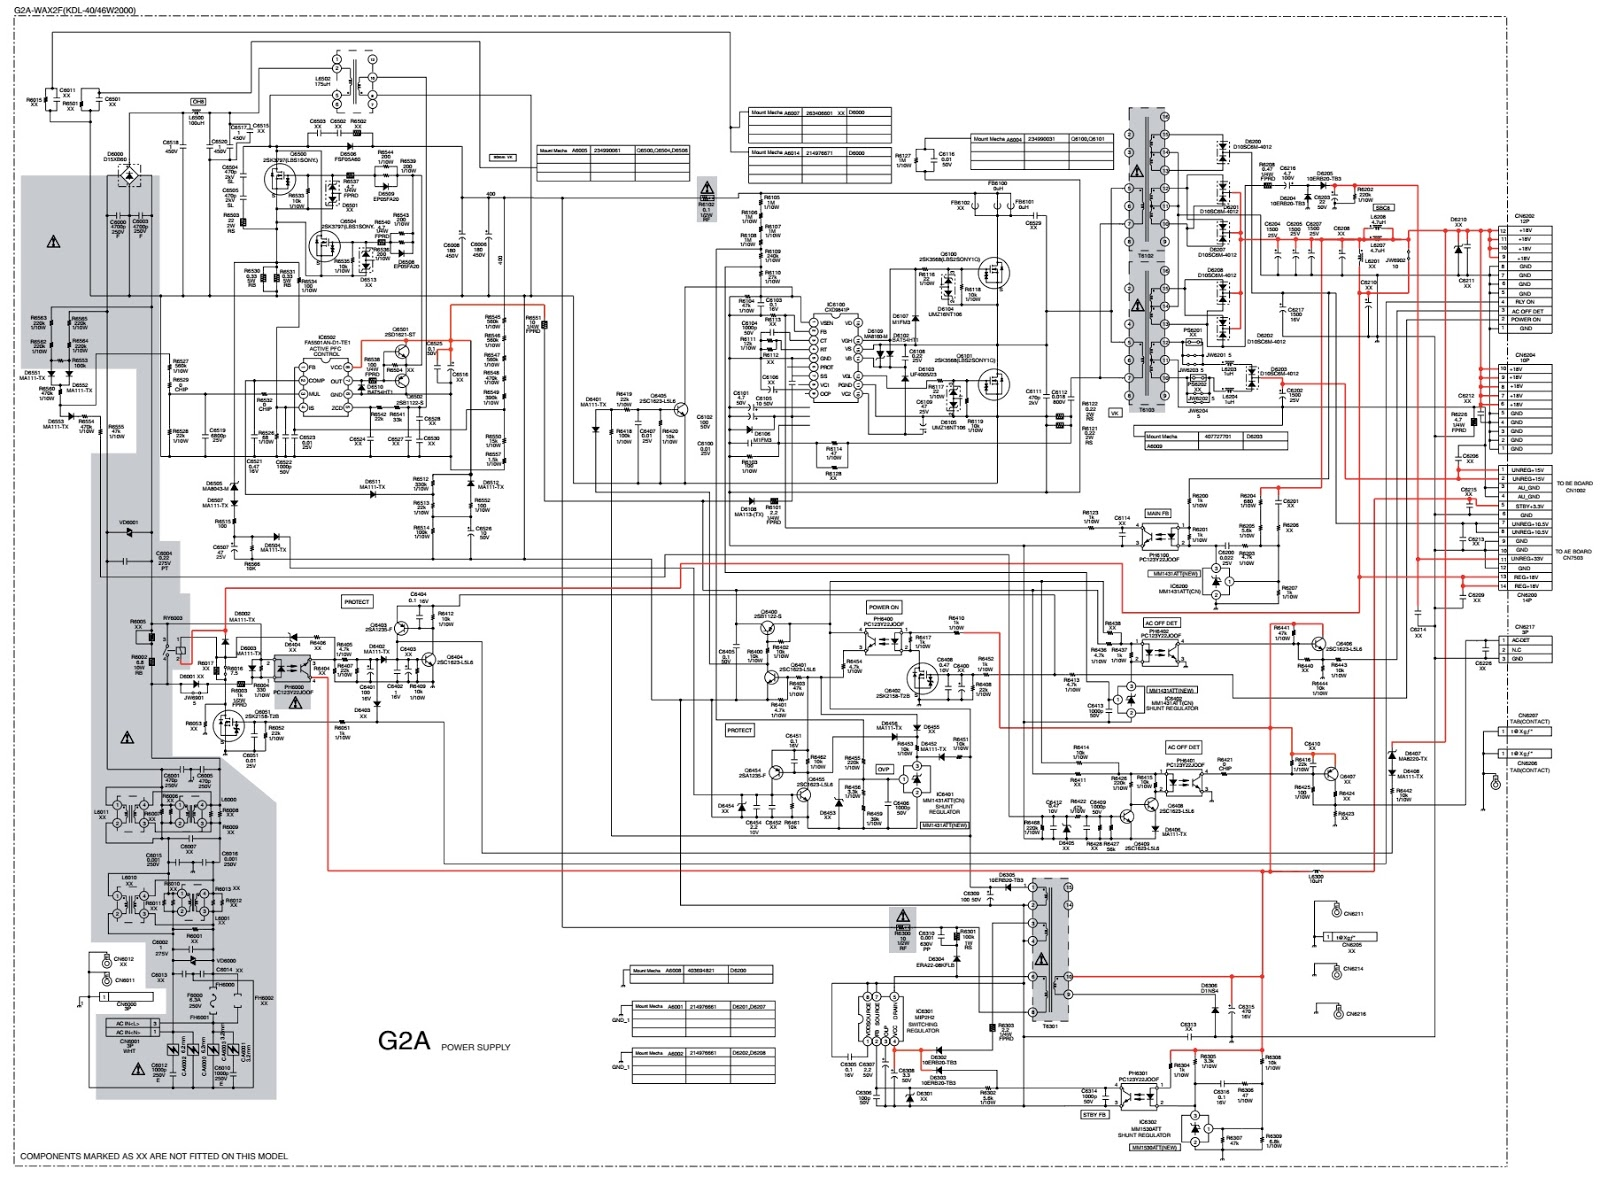 diagram sony led tv diagram full version hd quality tv diagram konka led lcd tv 32f3000c supra stv lcs26740 tv schematic power and [ 1600 x 1177 Pixel ]